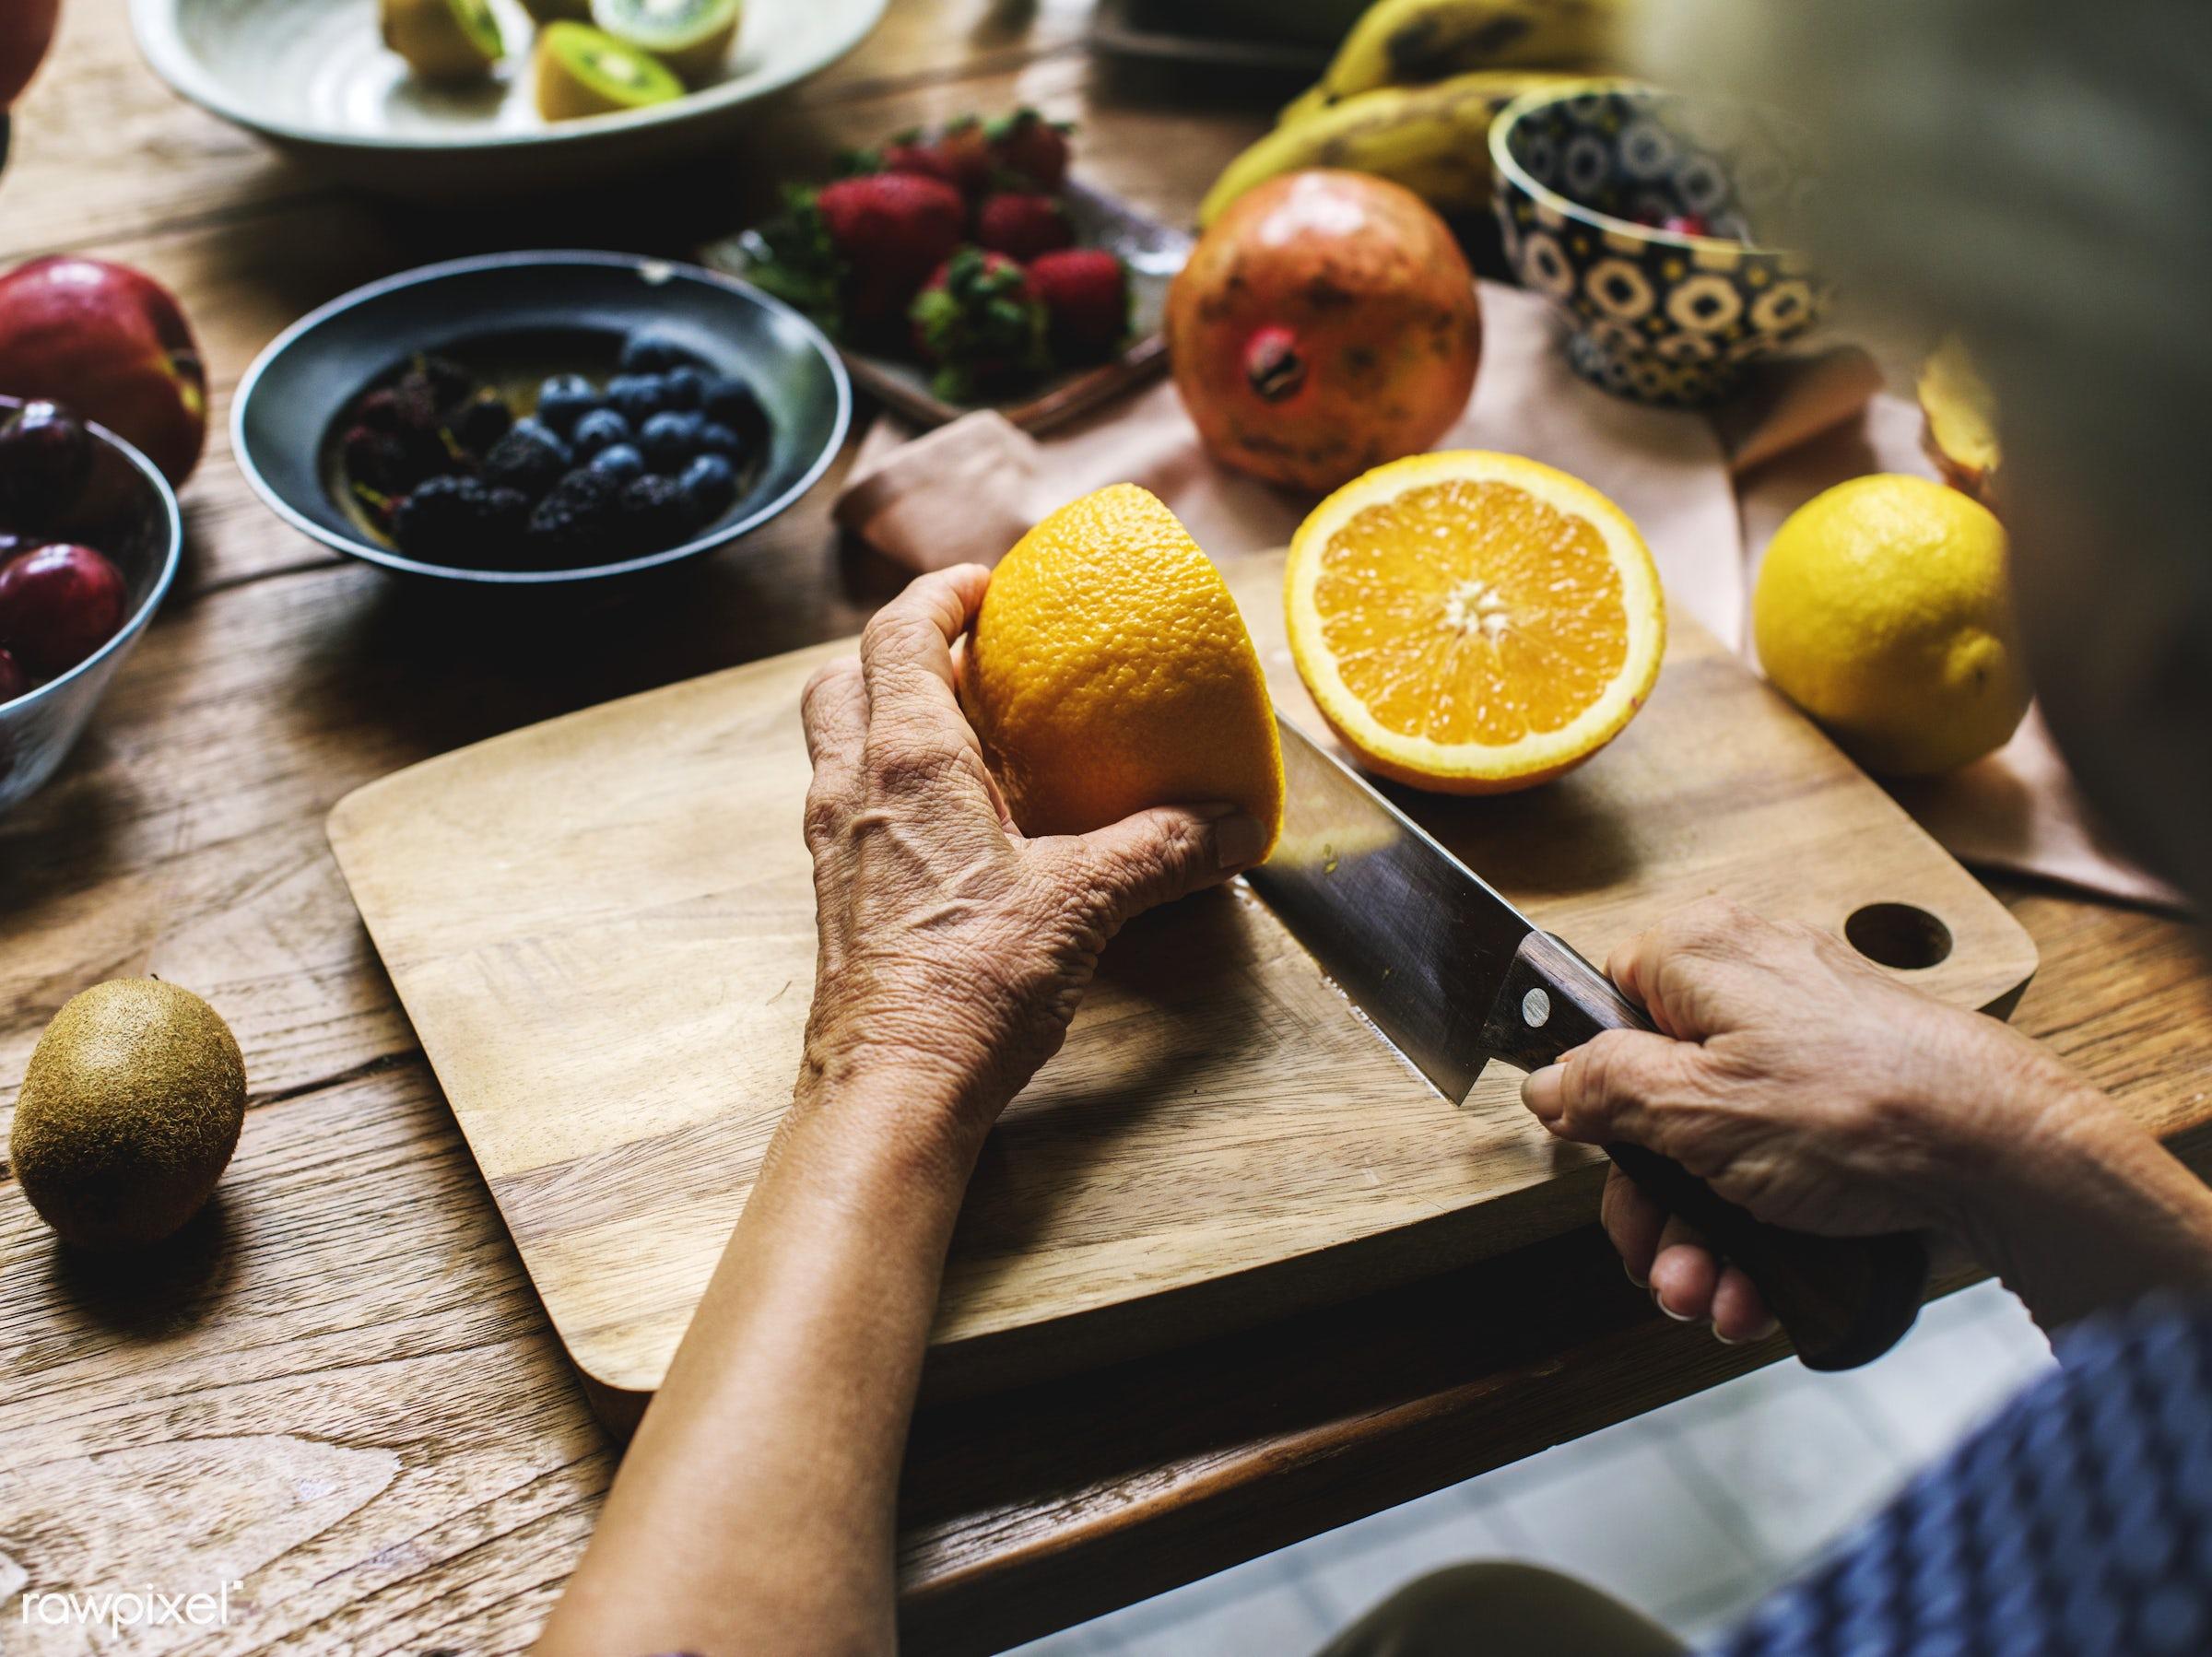 diverse, real, hands, fresh, various, closeup, meal, superfood, orange, cut board, chopping, fruits, prepare, cutting, board...